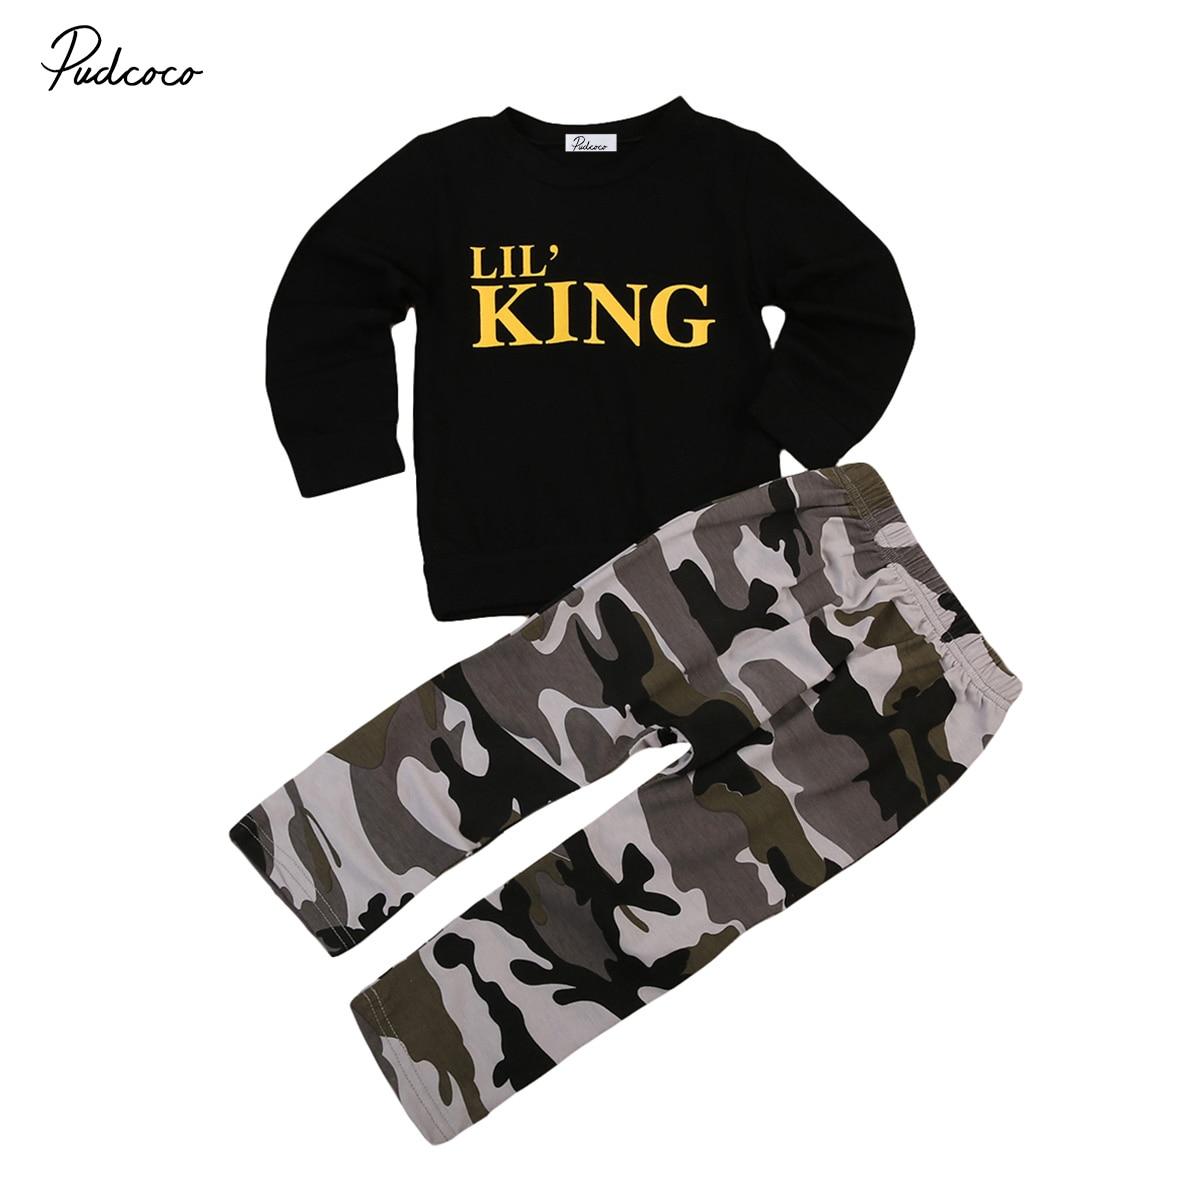 2pcs Newborn Toddler Kids Baby Boys Clothes T-shirt Tops+Long Pants Outfits Set